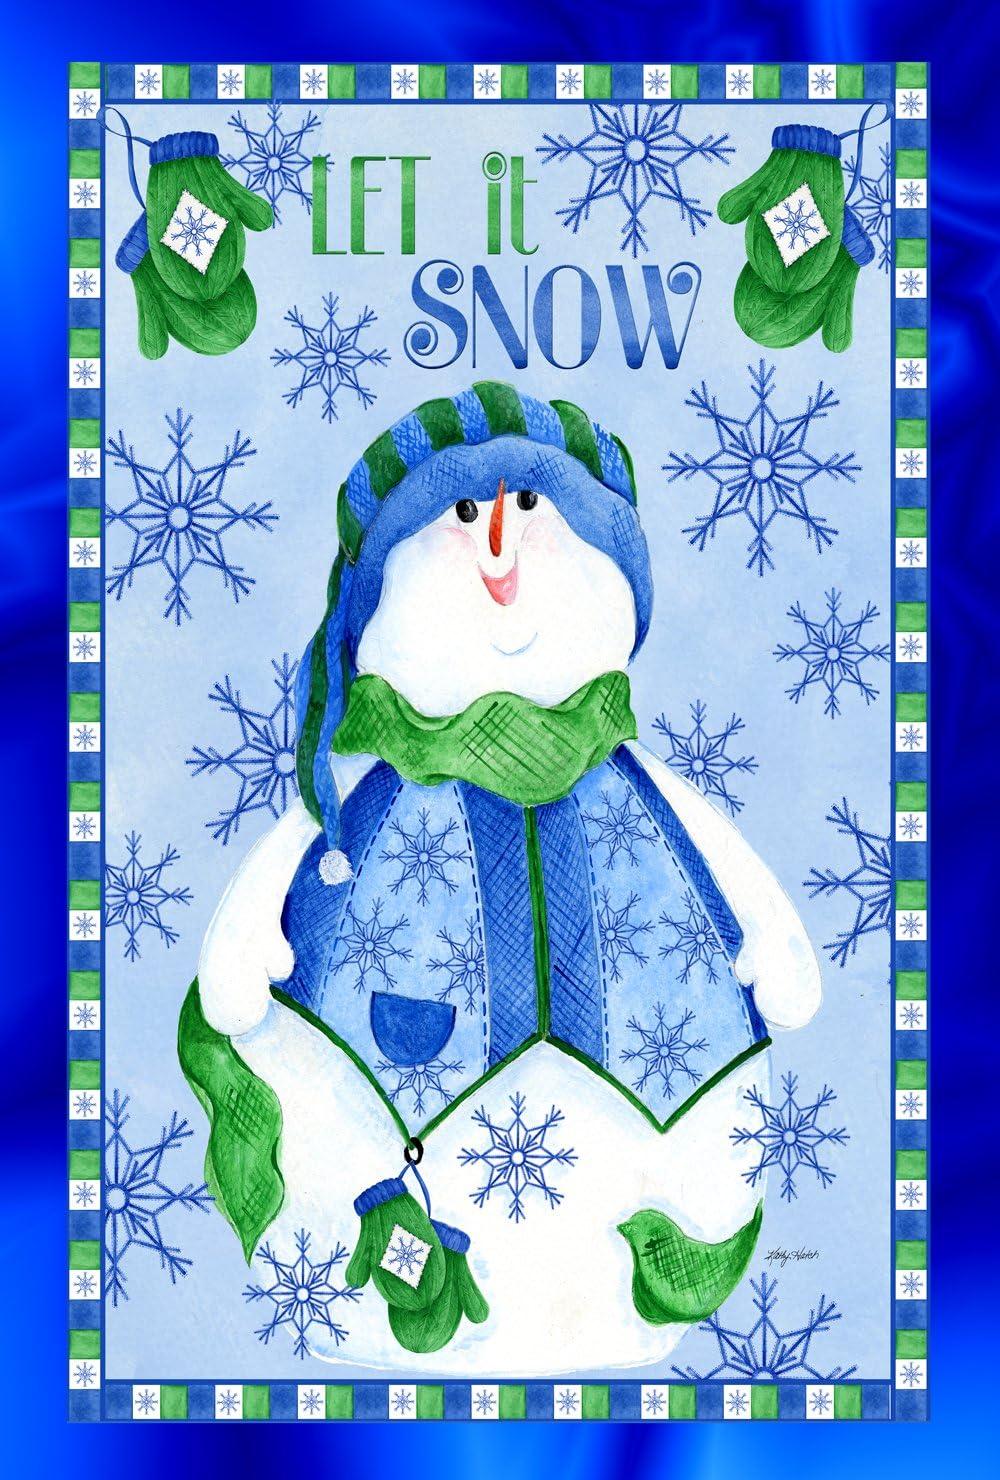 Toland Home Garden Snowman Mitten 28 x 40 Inch Decorative Winter Snowflake Let It Snow House Flag - 109712